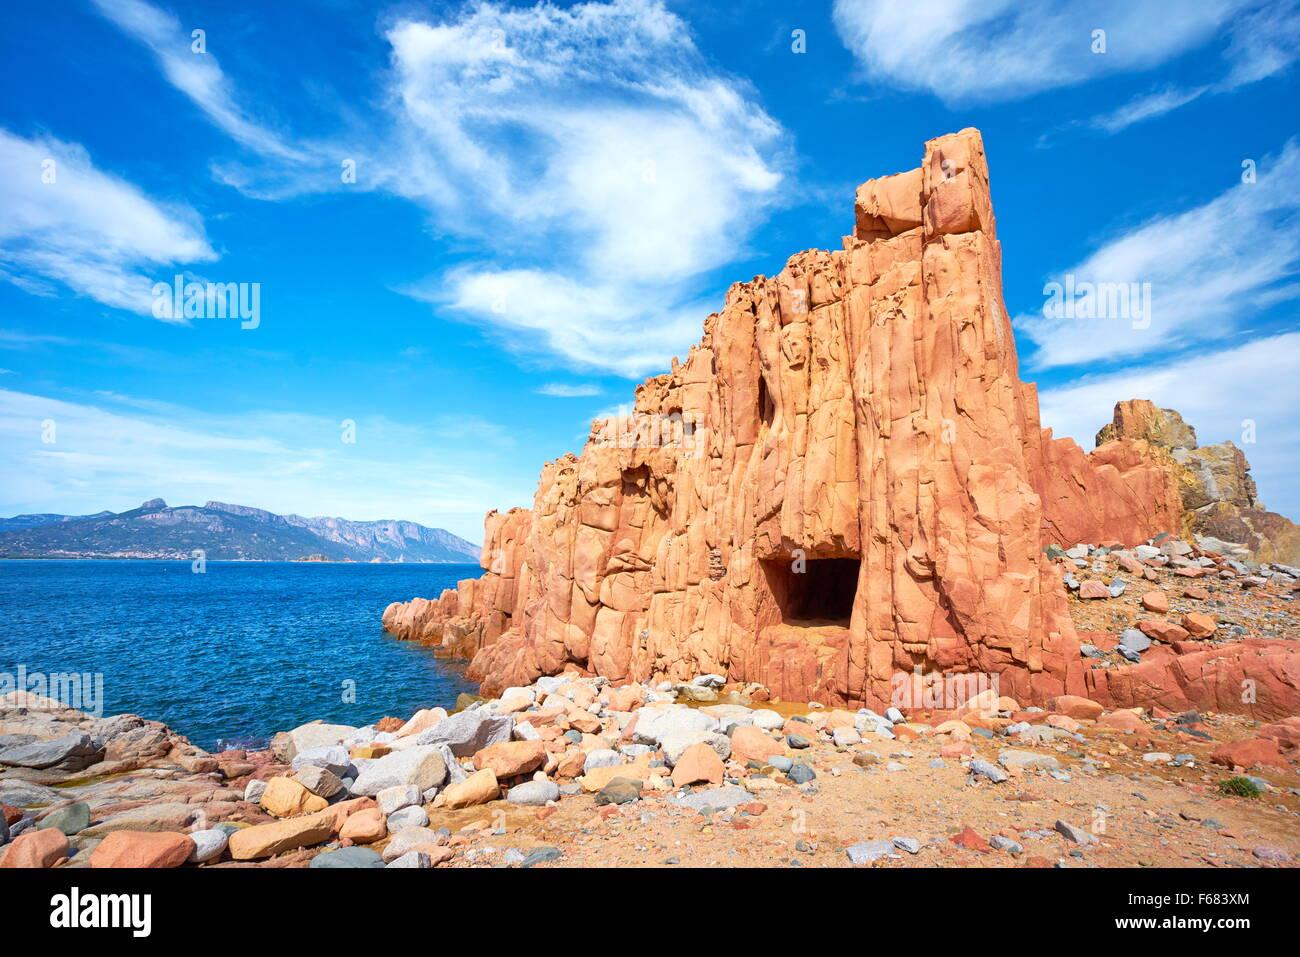 Arbatax, Red Rocks, Golfo di Orosei, Insel Sardinien, Italien Stockbild